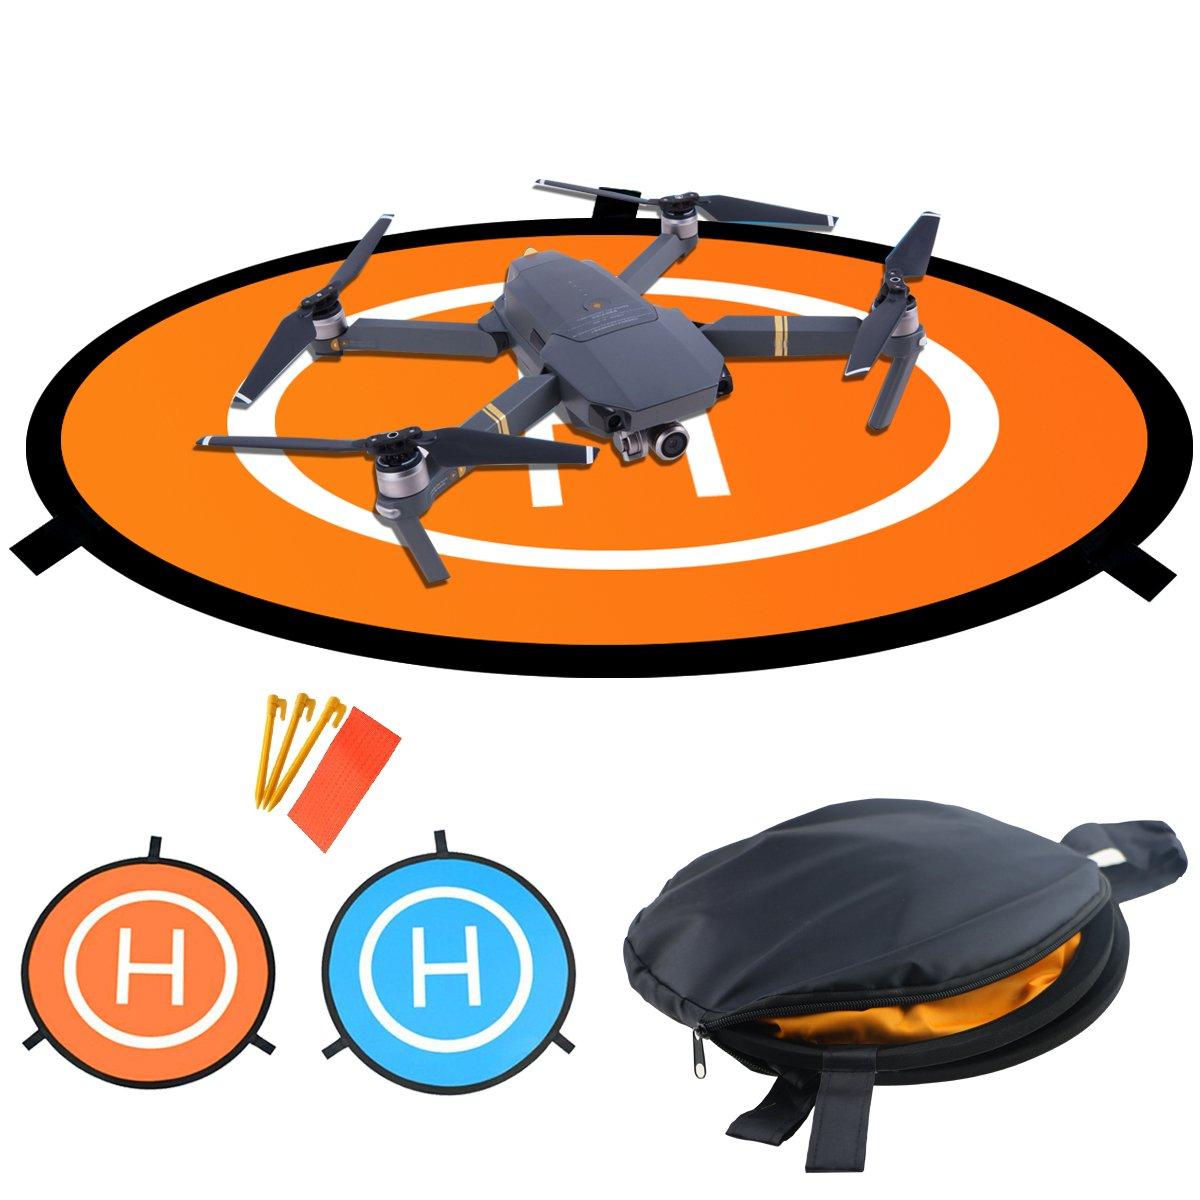 Pad%EF%BC%8CHomga Universal Waterproof Portable Helicopter